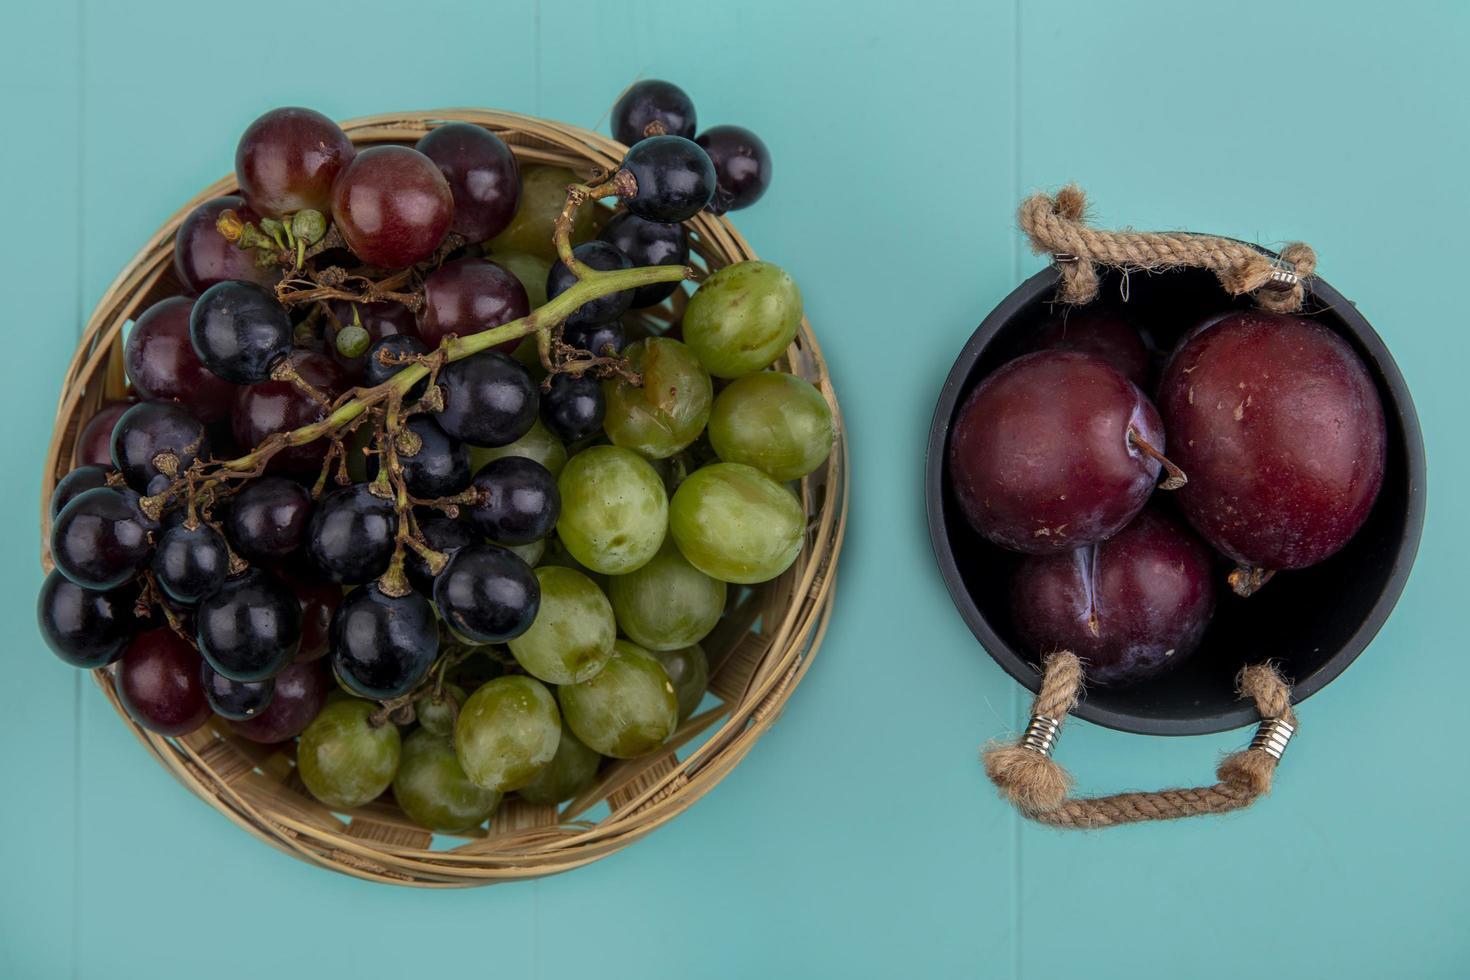 frutta assortita su sfondo blu foto